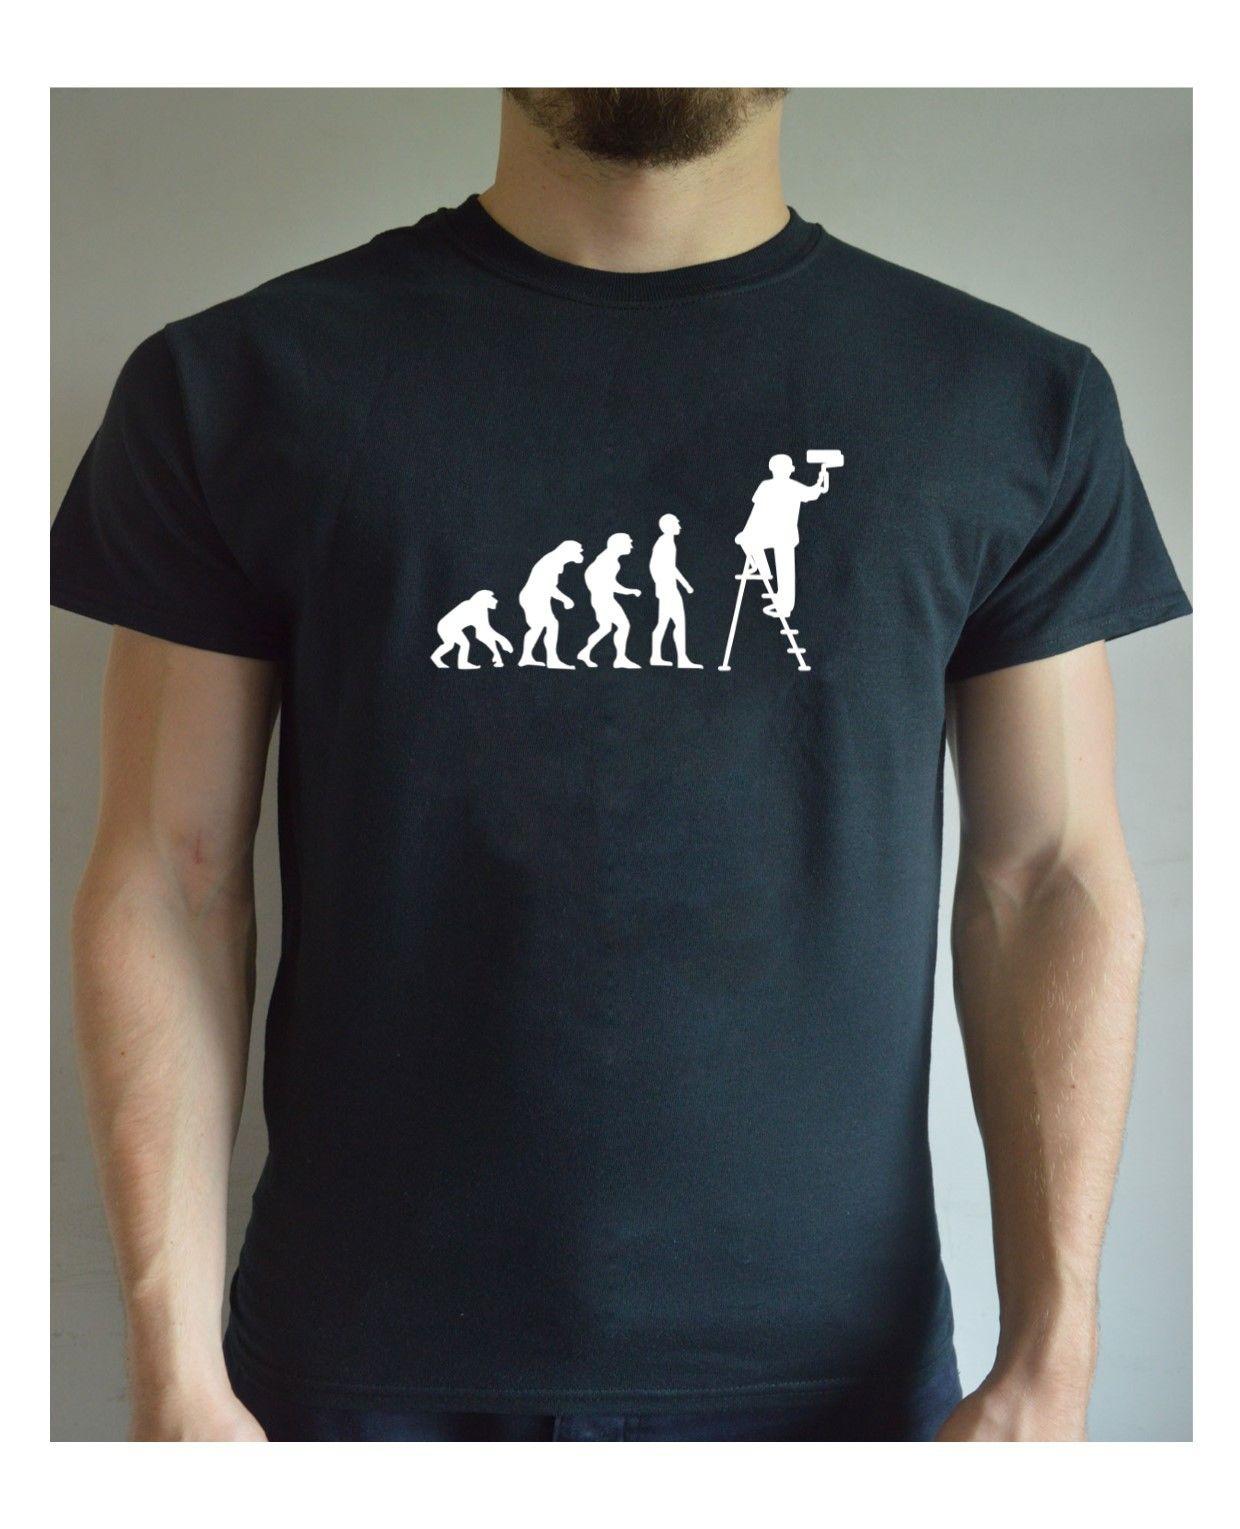 Funny Printed T Shirt Evolution - Painter Painting Christmas Present Joke